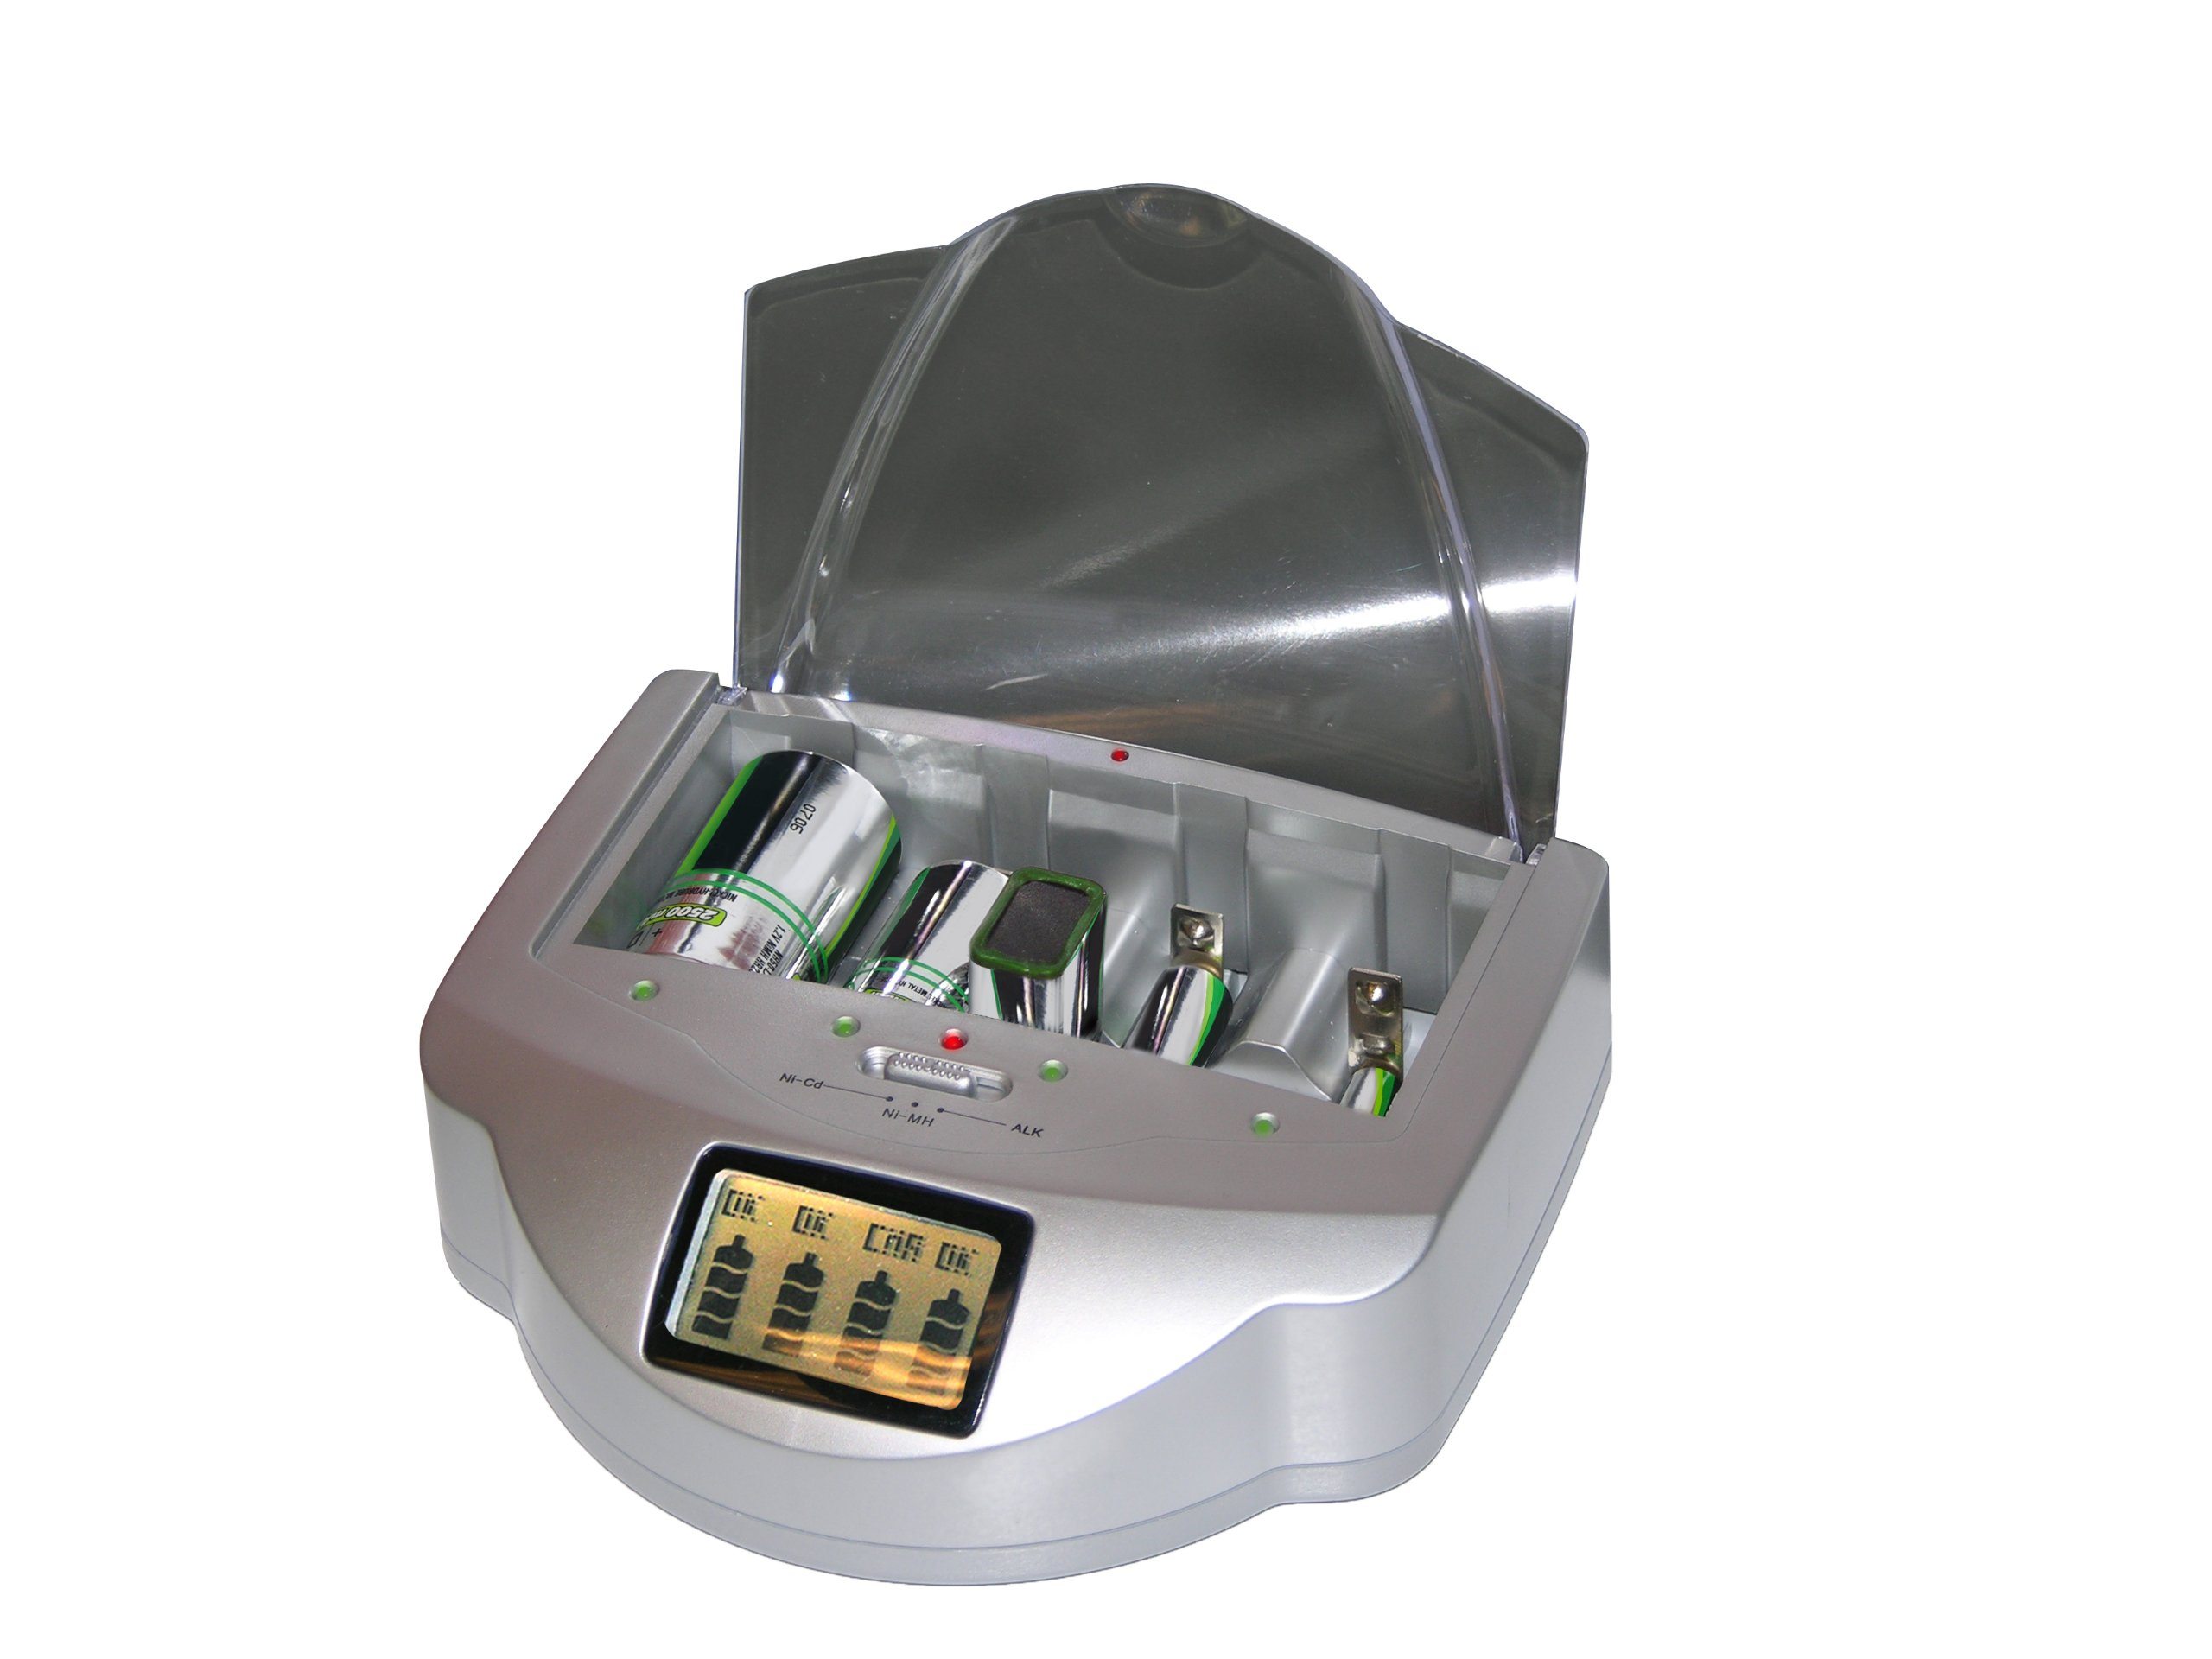 Viatek RE02G Renu-It Pro Series GrayProfessional Grad Disposable Battery Regenerator/Used for AA, AAA, C, D & 9-Volt Batteries by Viatek Consumer Products